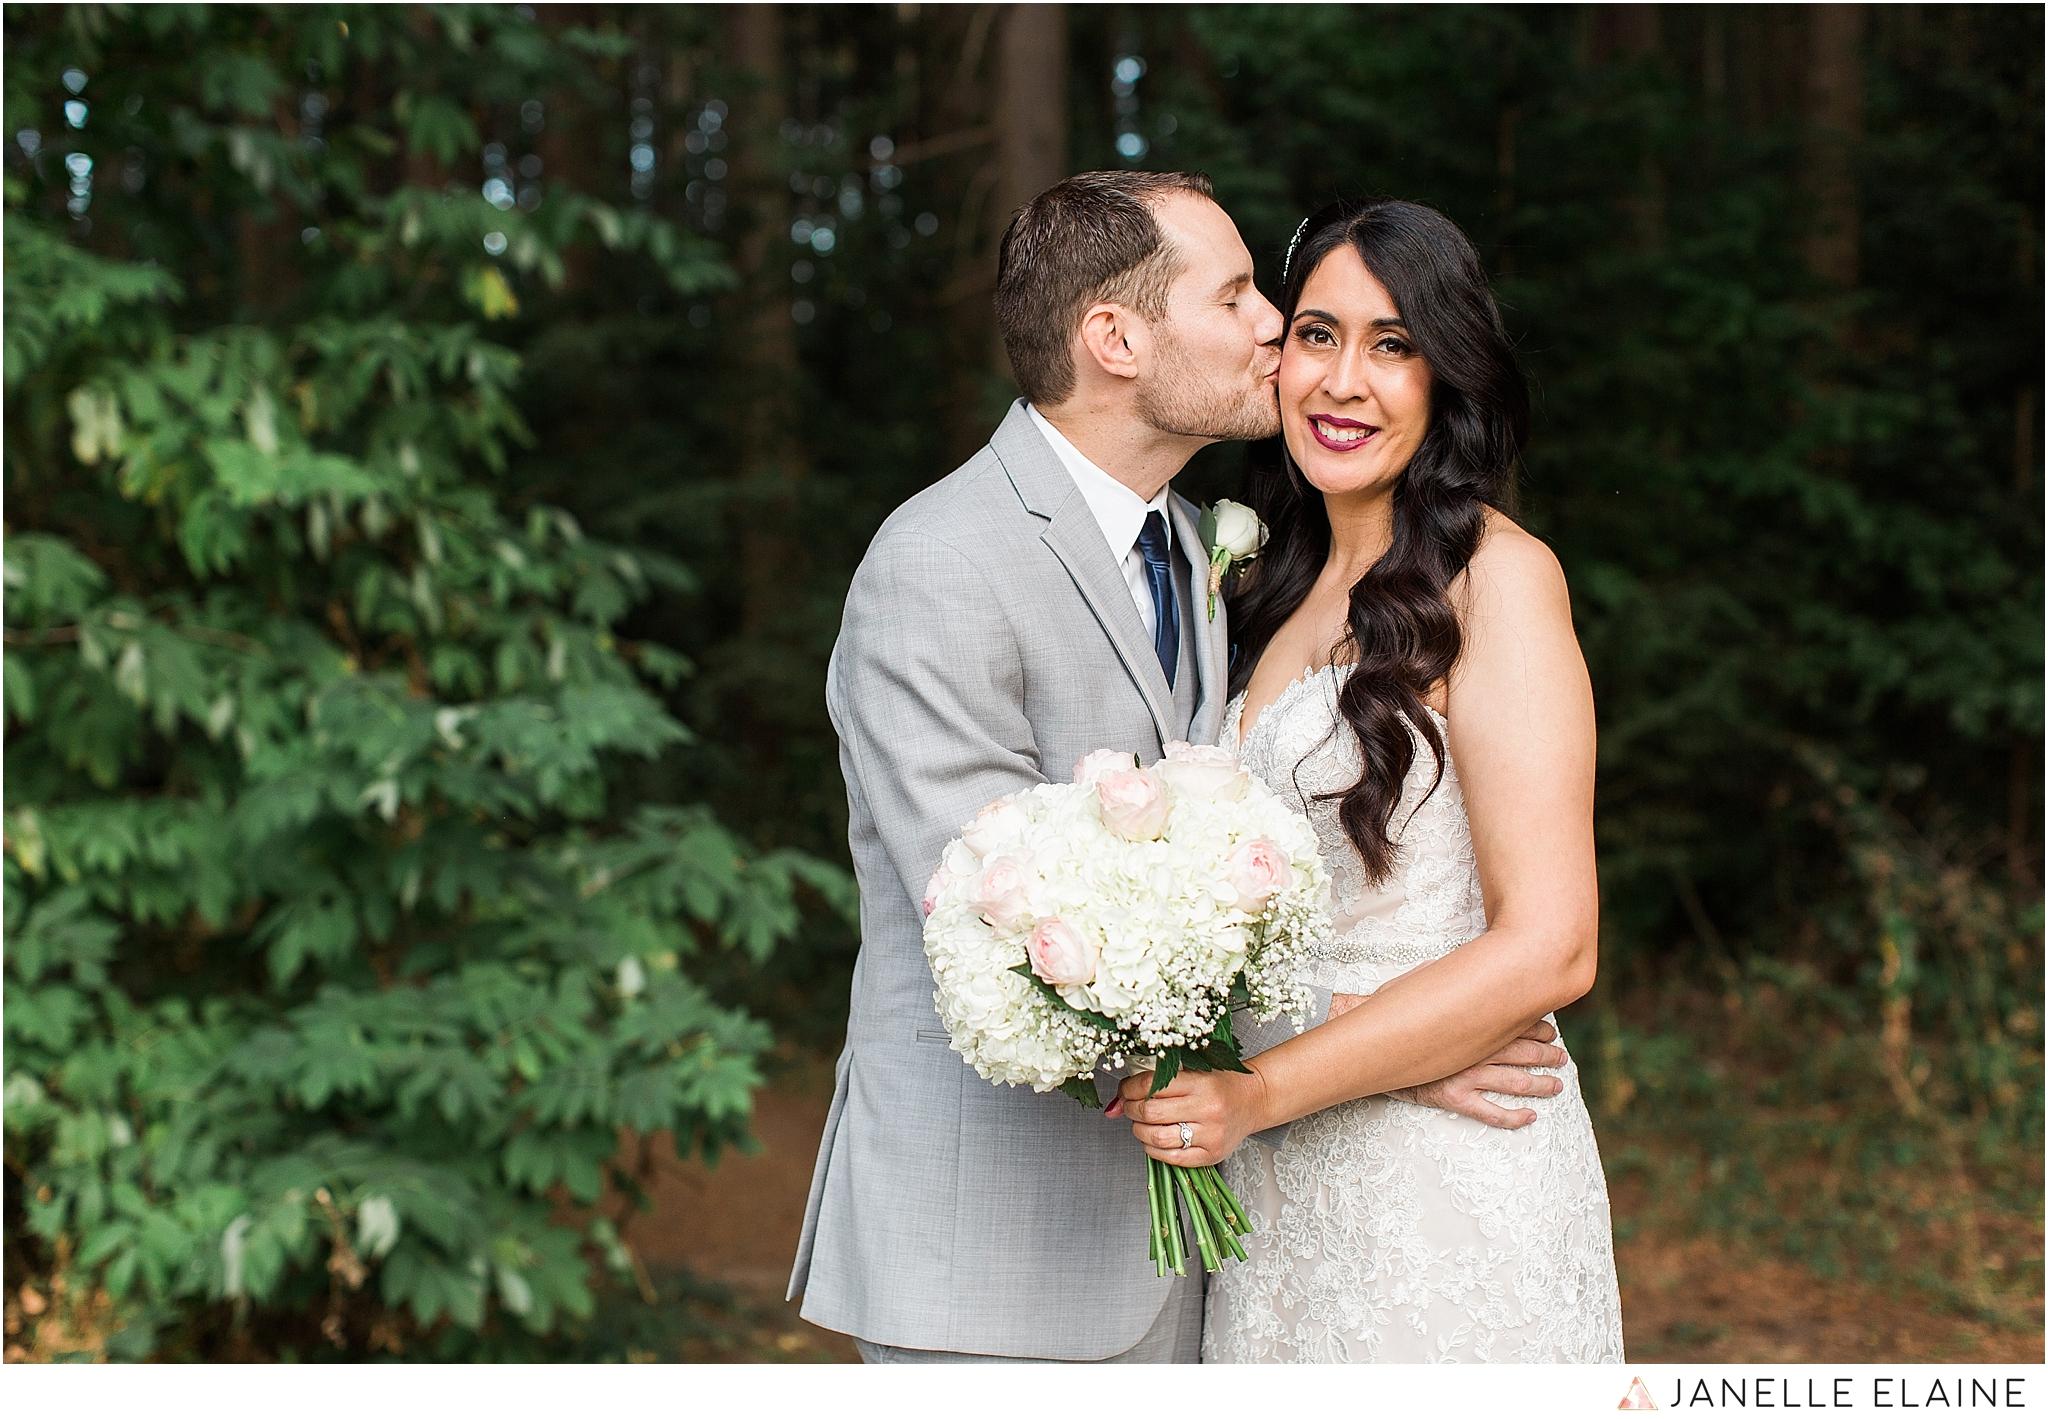 janelle elaine photography-professional wedding photographer-seattle-bellevue-robinswood house-196.jpg